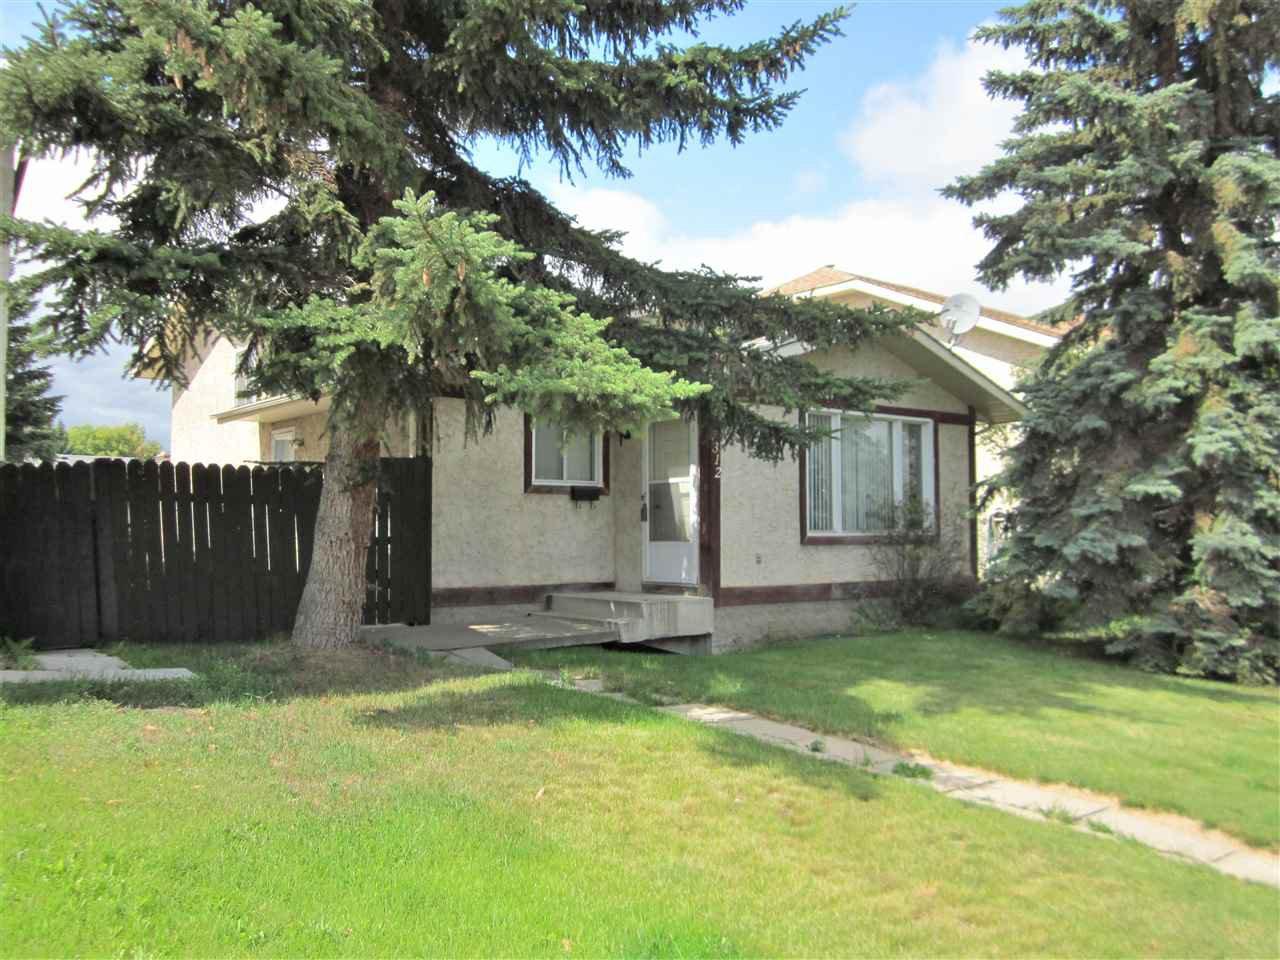 Main Photo: 7312 189 Street in Edmonton: Zone 20 House for sale : MLS®# E4169112